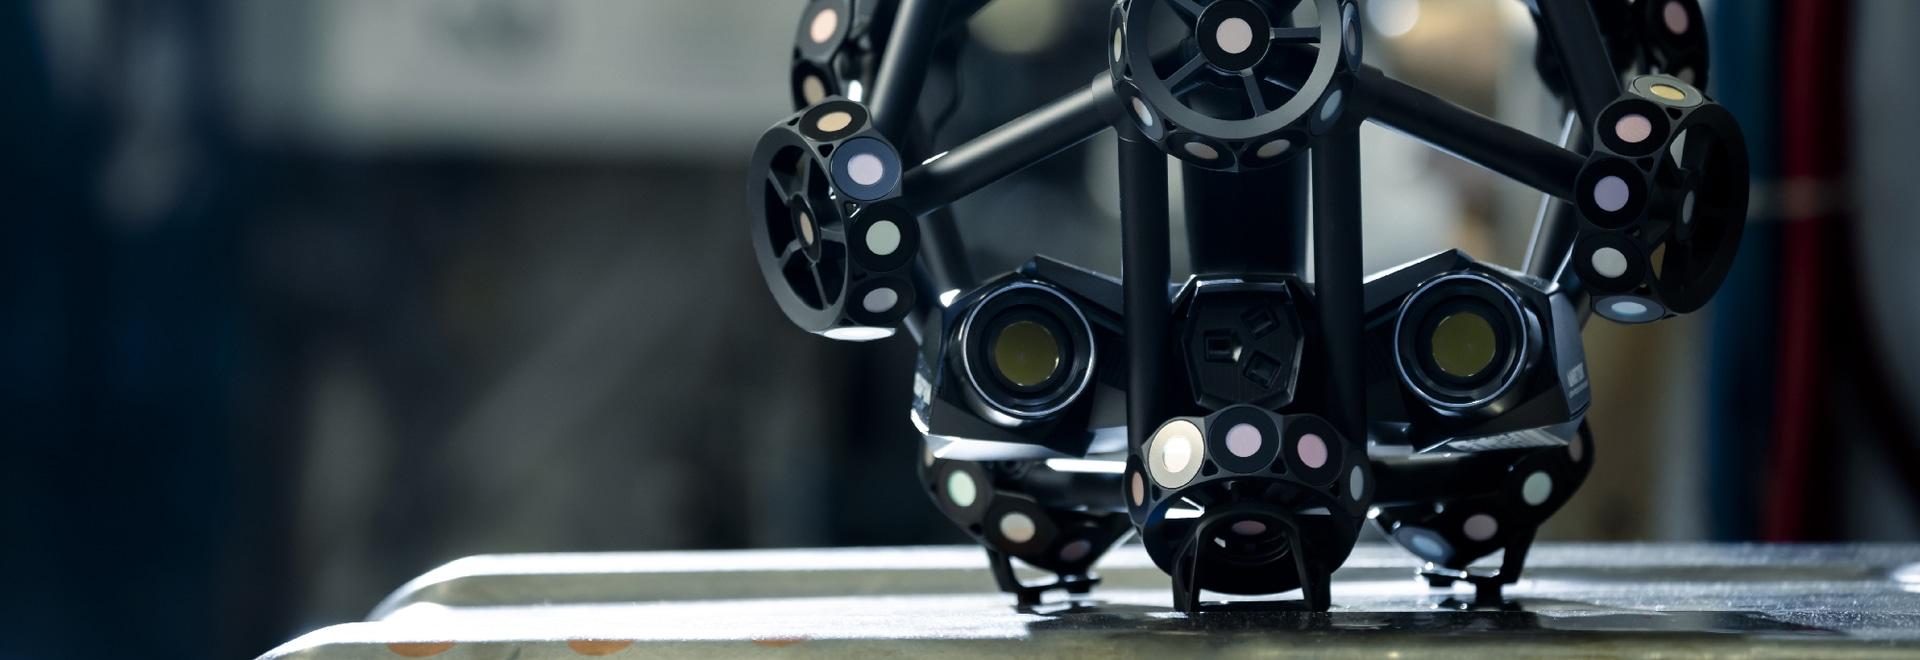 Creaform präsentiert neuen 3D-Scanner MetraSCAN BLACK